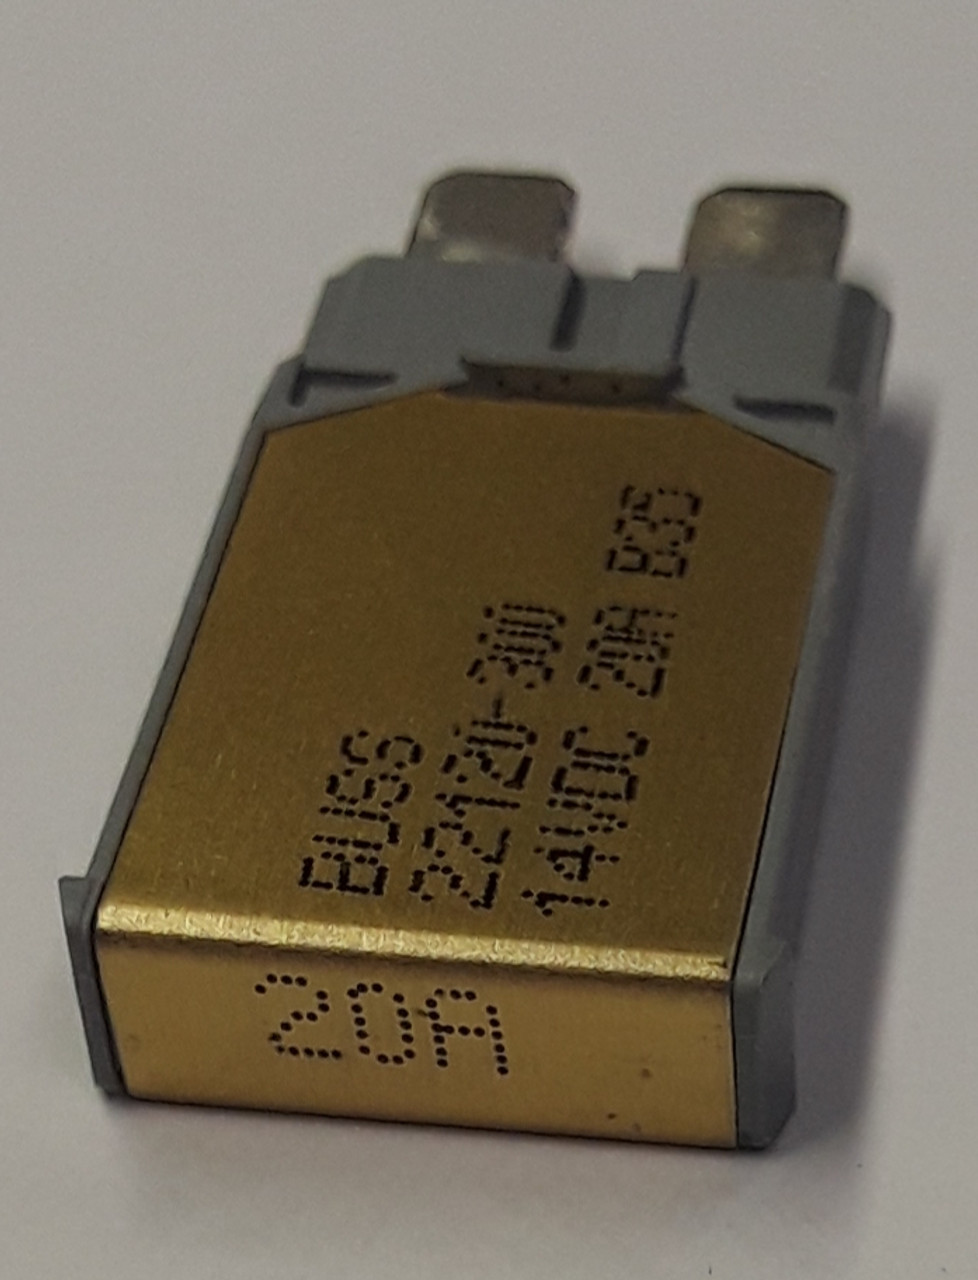 medium resolution of 22120 300 cooper bussmann 20 amp mini circuit breaker with atc 22120 300 cooper bussmann type